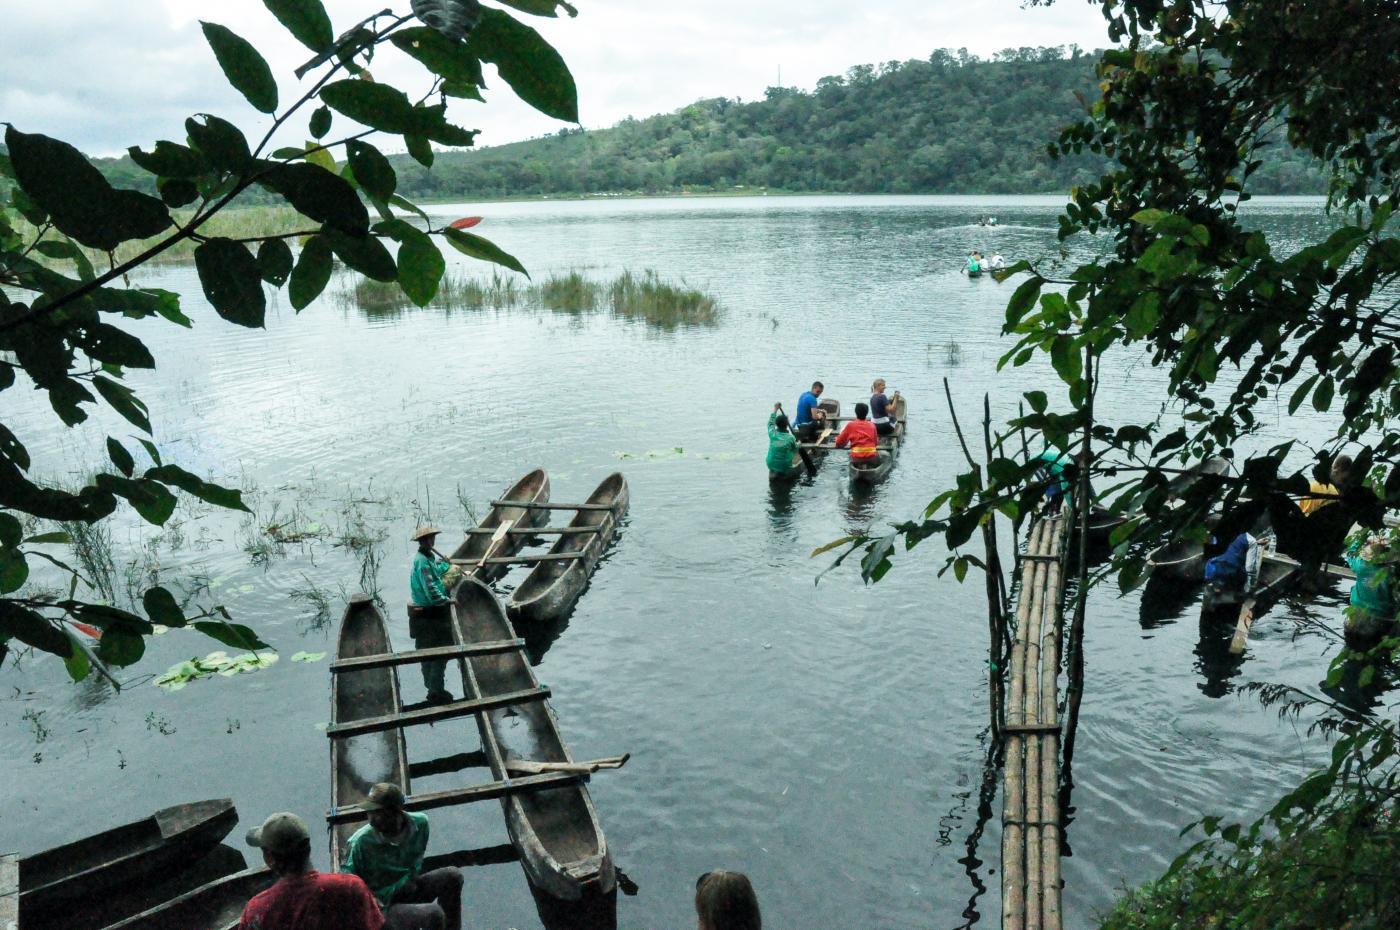 jungle trek autour du lake tamblingan villa bossi bali. Black Bedroom Furniture Sets. Home Design Ideas